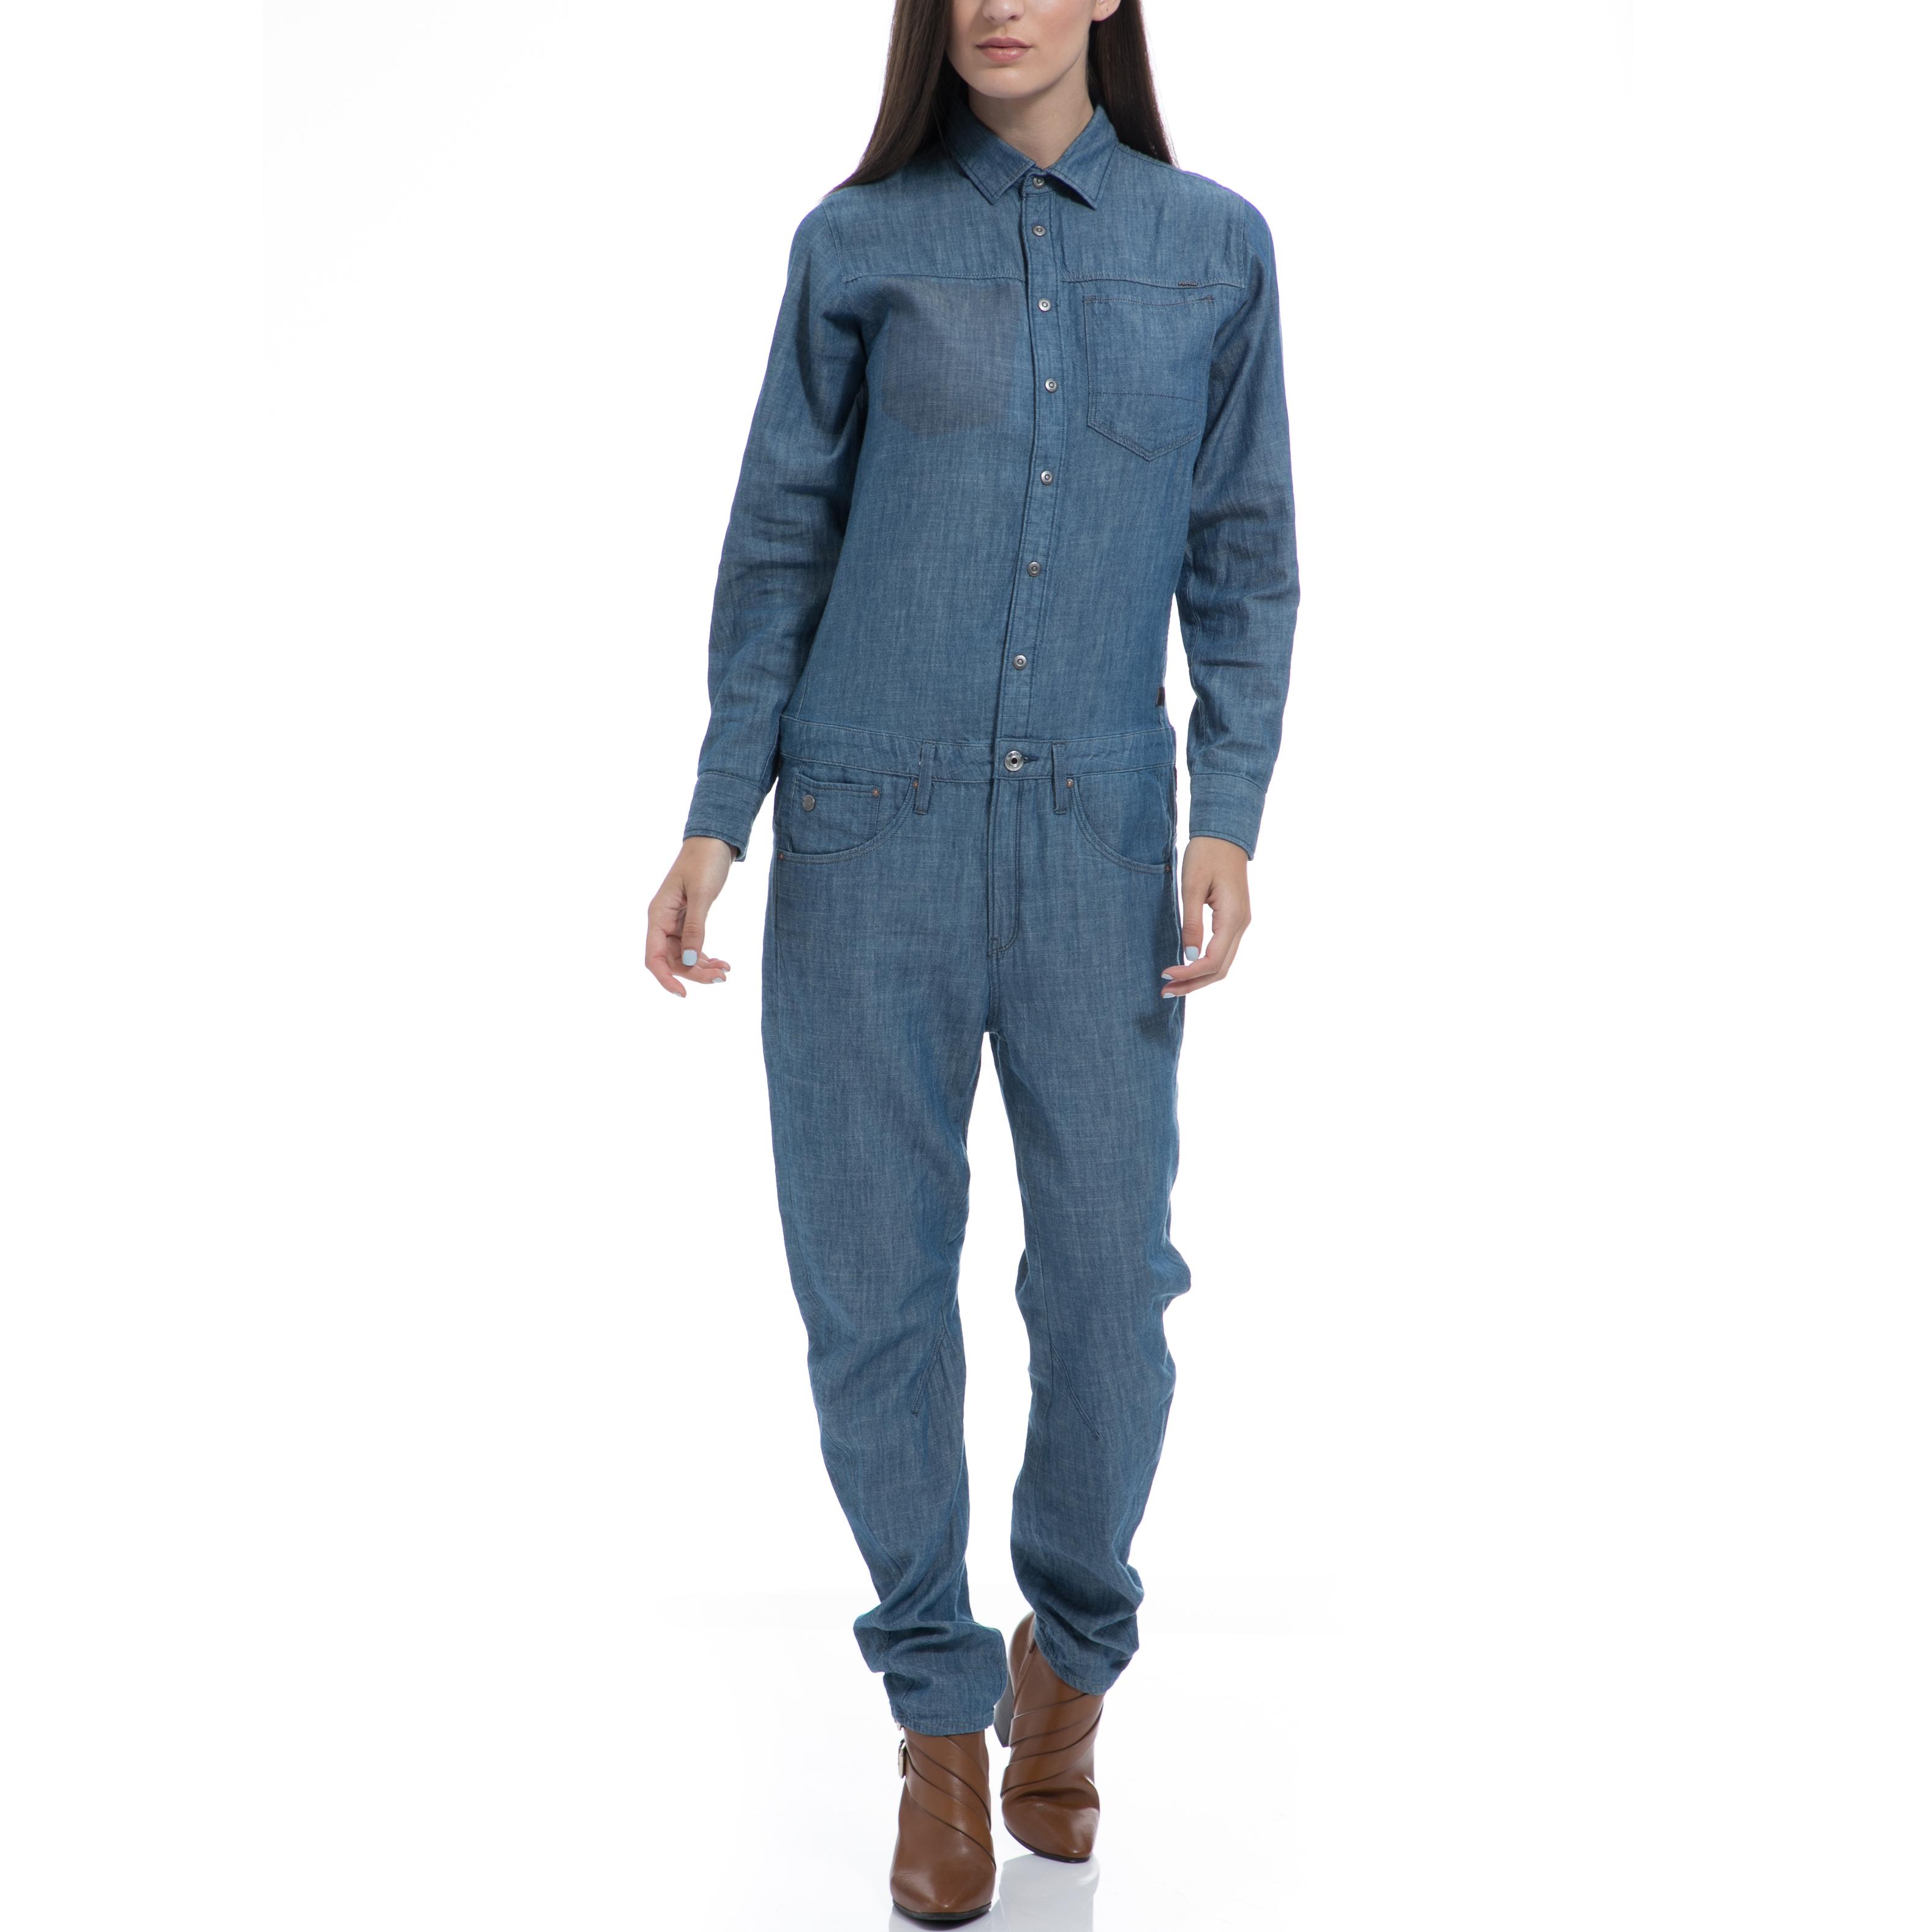 G-STAR RAW - Γυναικεία ολόσωμη φόρμα G-STAR RAW μπλε γυναικεία ρούχα ολόσωμες φόρμες